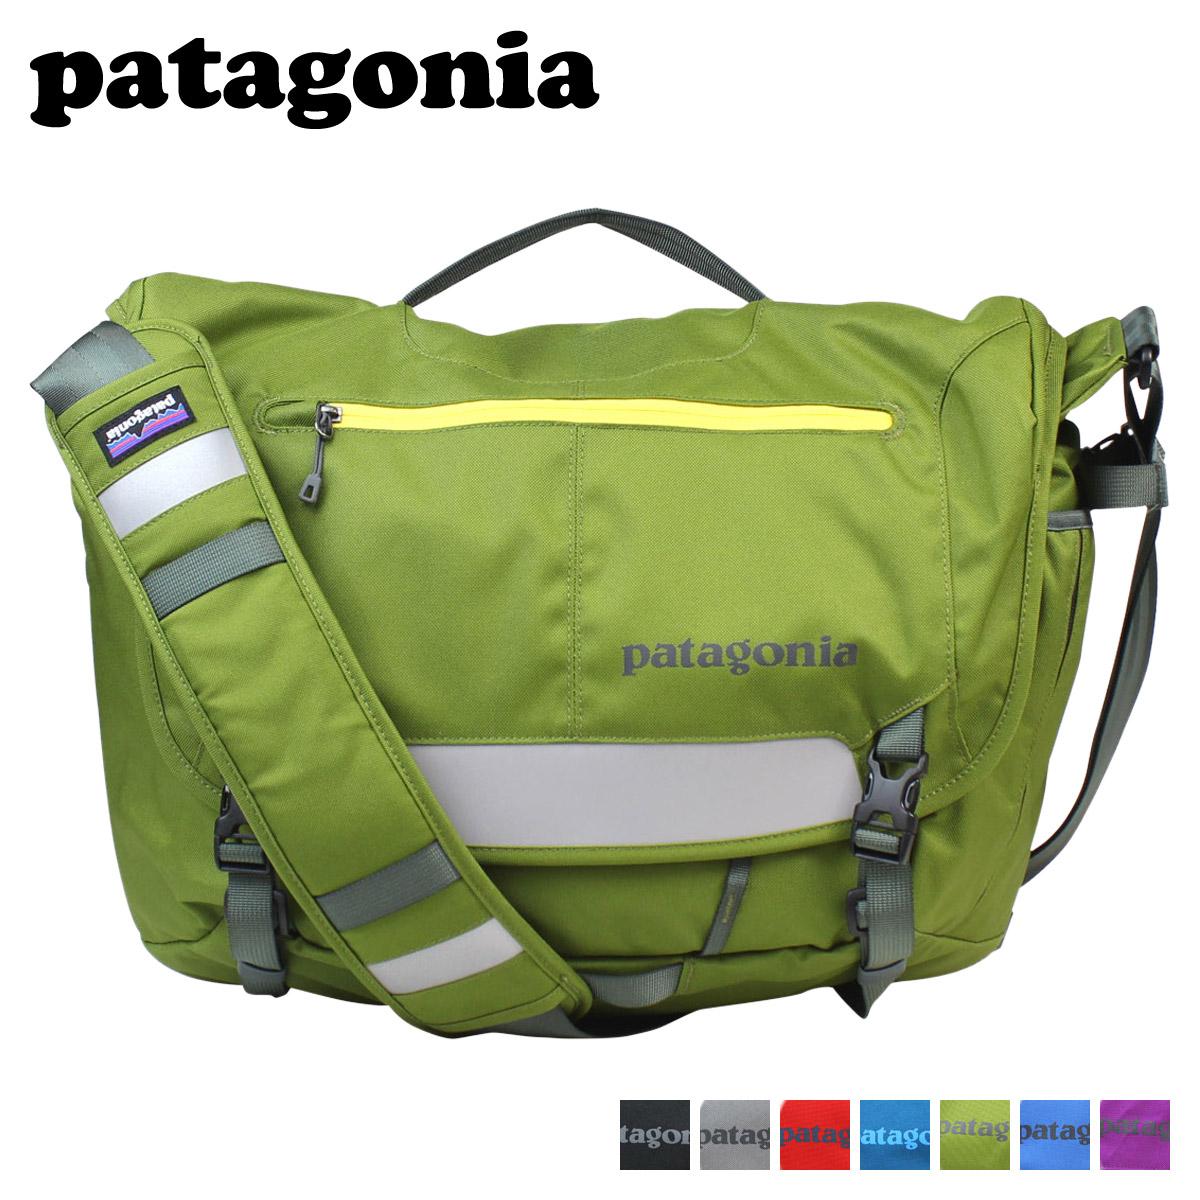 Whats Up Sports Patagonia Bags Messenger Bag Shoulder Half Mass 15 L 48316 Men Women Rakuten Global Market